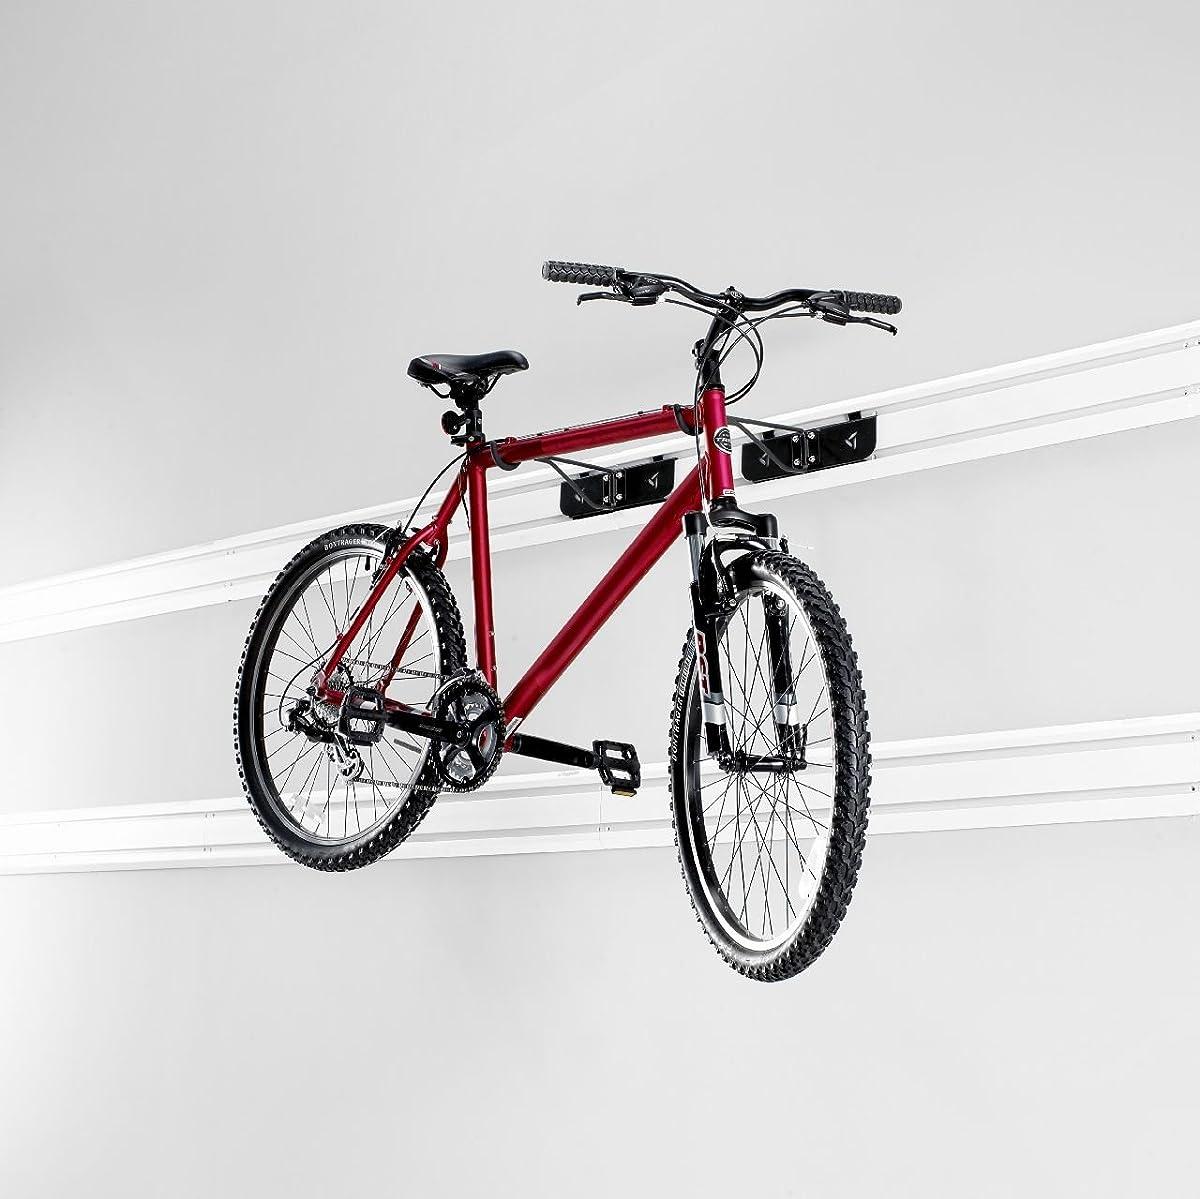 Gladiator GAWUXXHBTG Horizontal Bike Hook